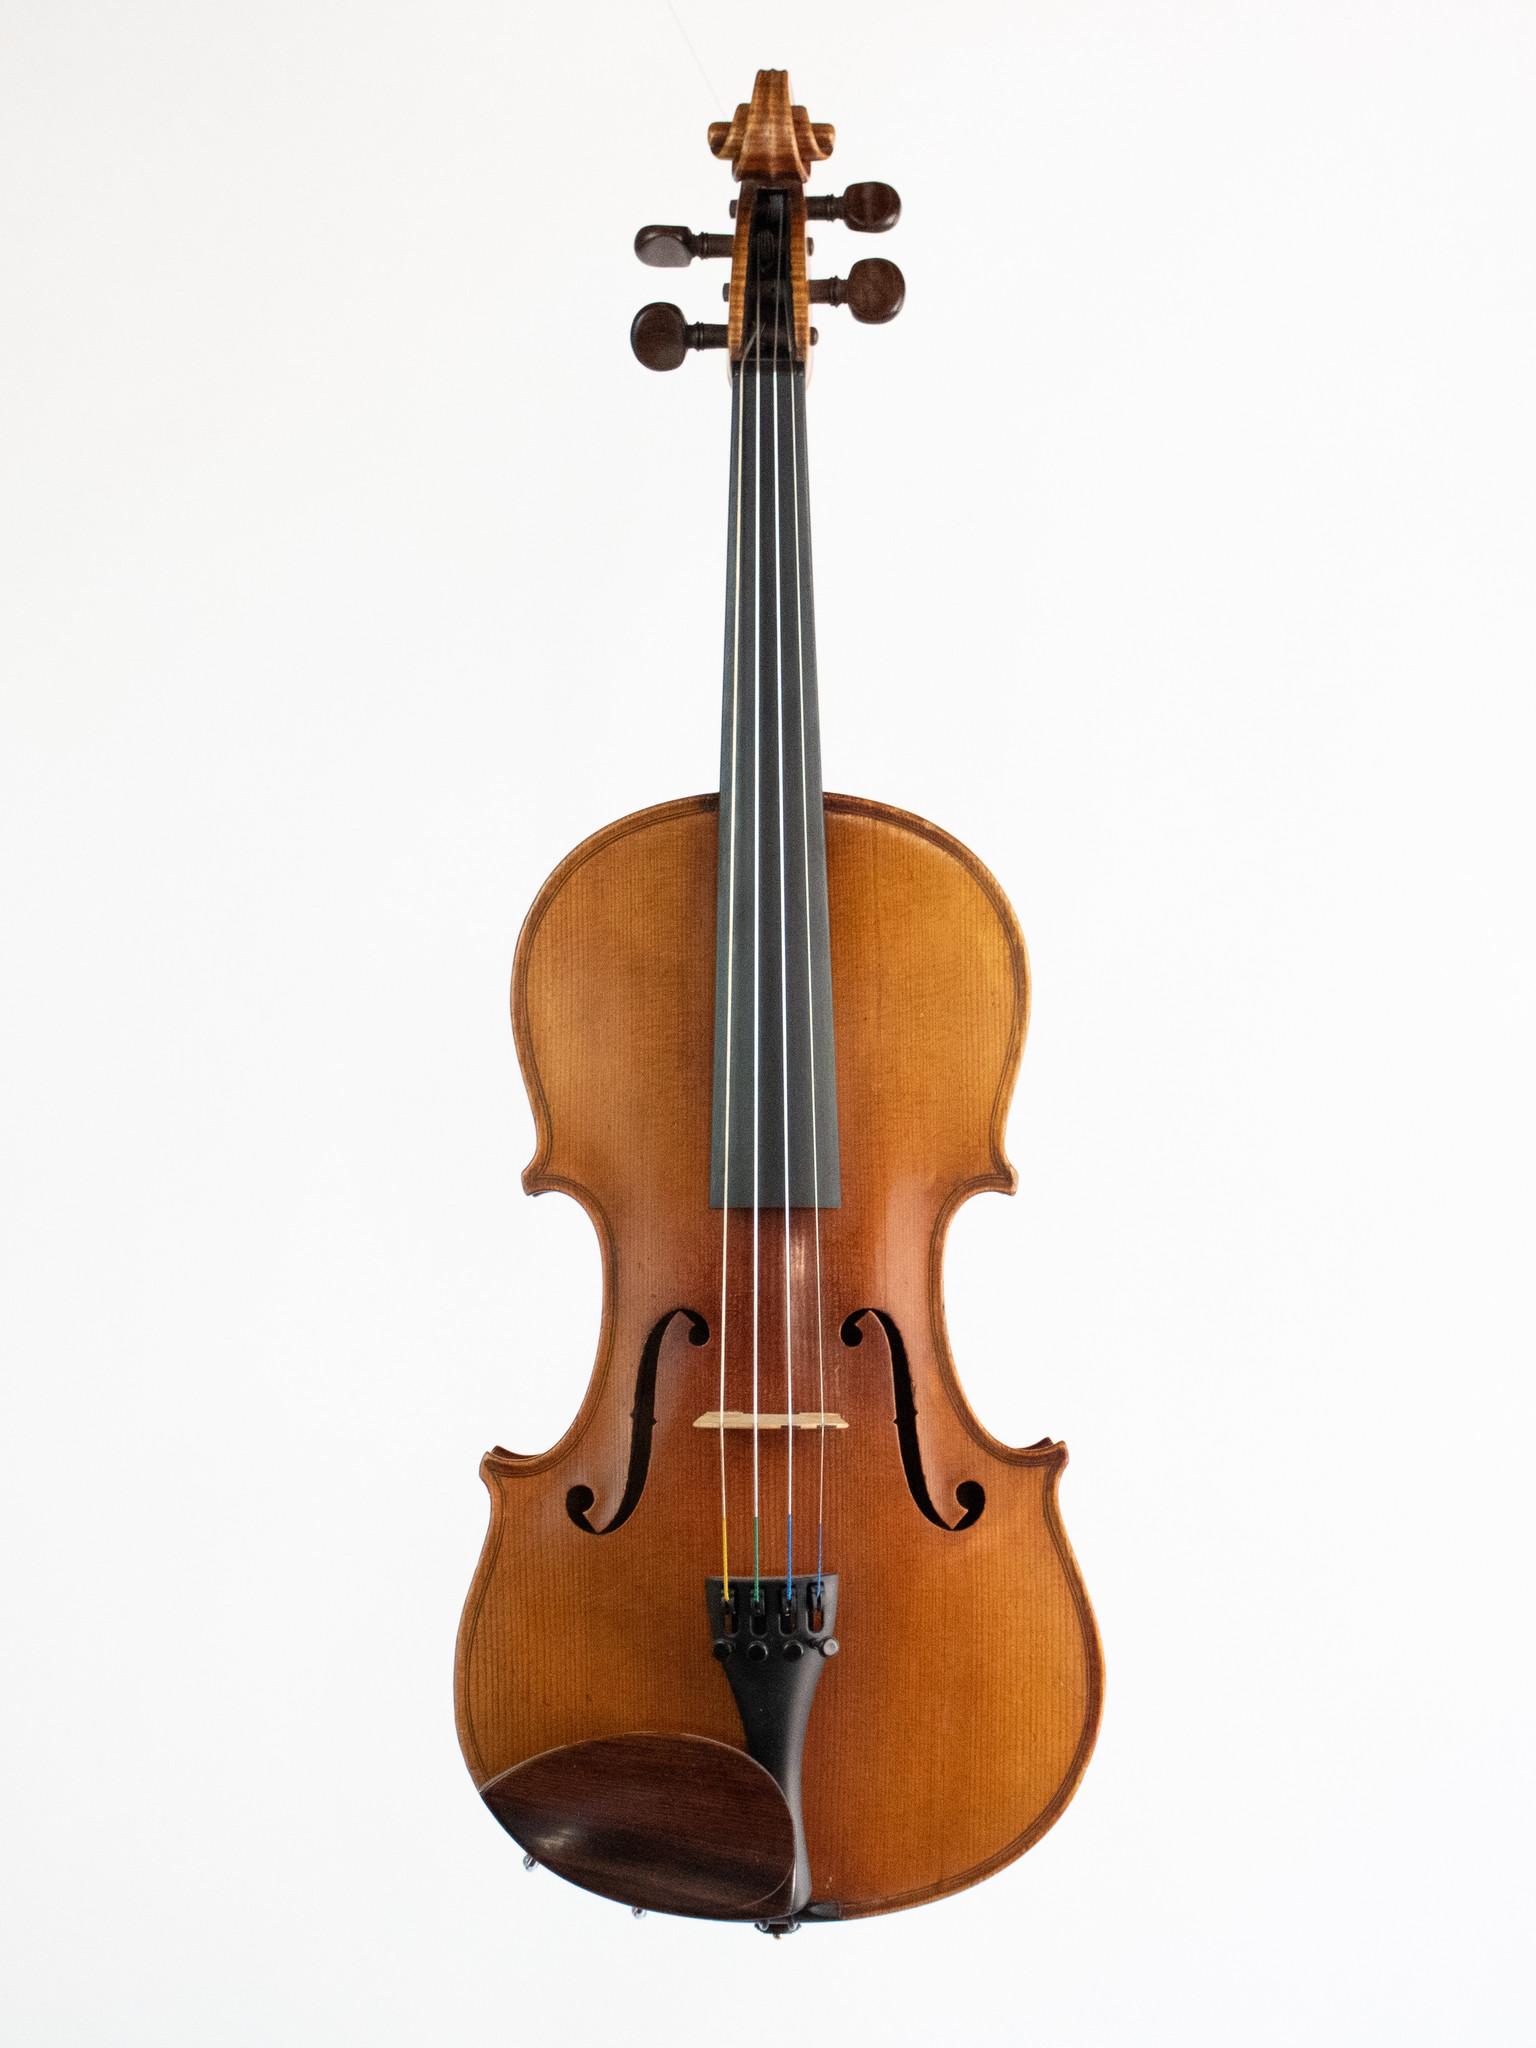 (Awaiting repair) Louis Lowendall violin, 1885, Dresden, GERMANY, repaired